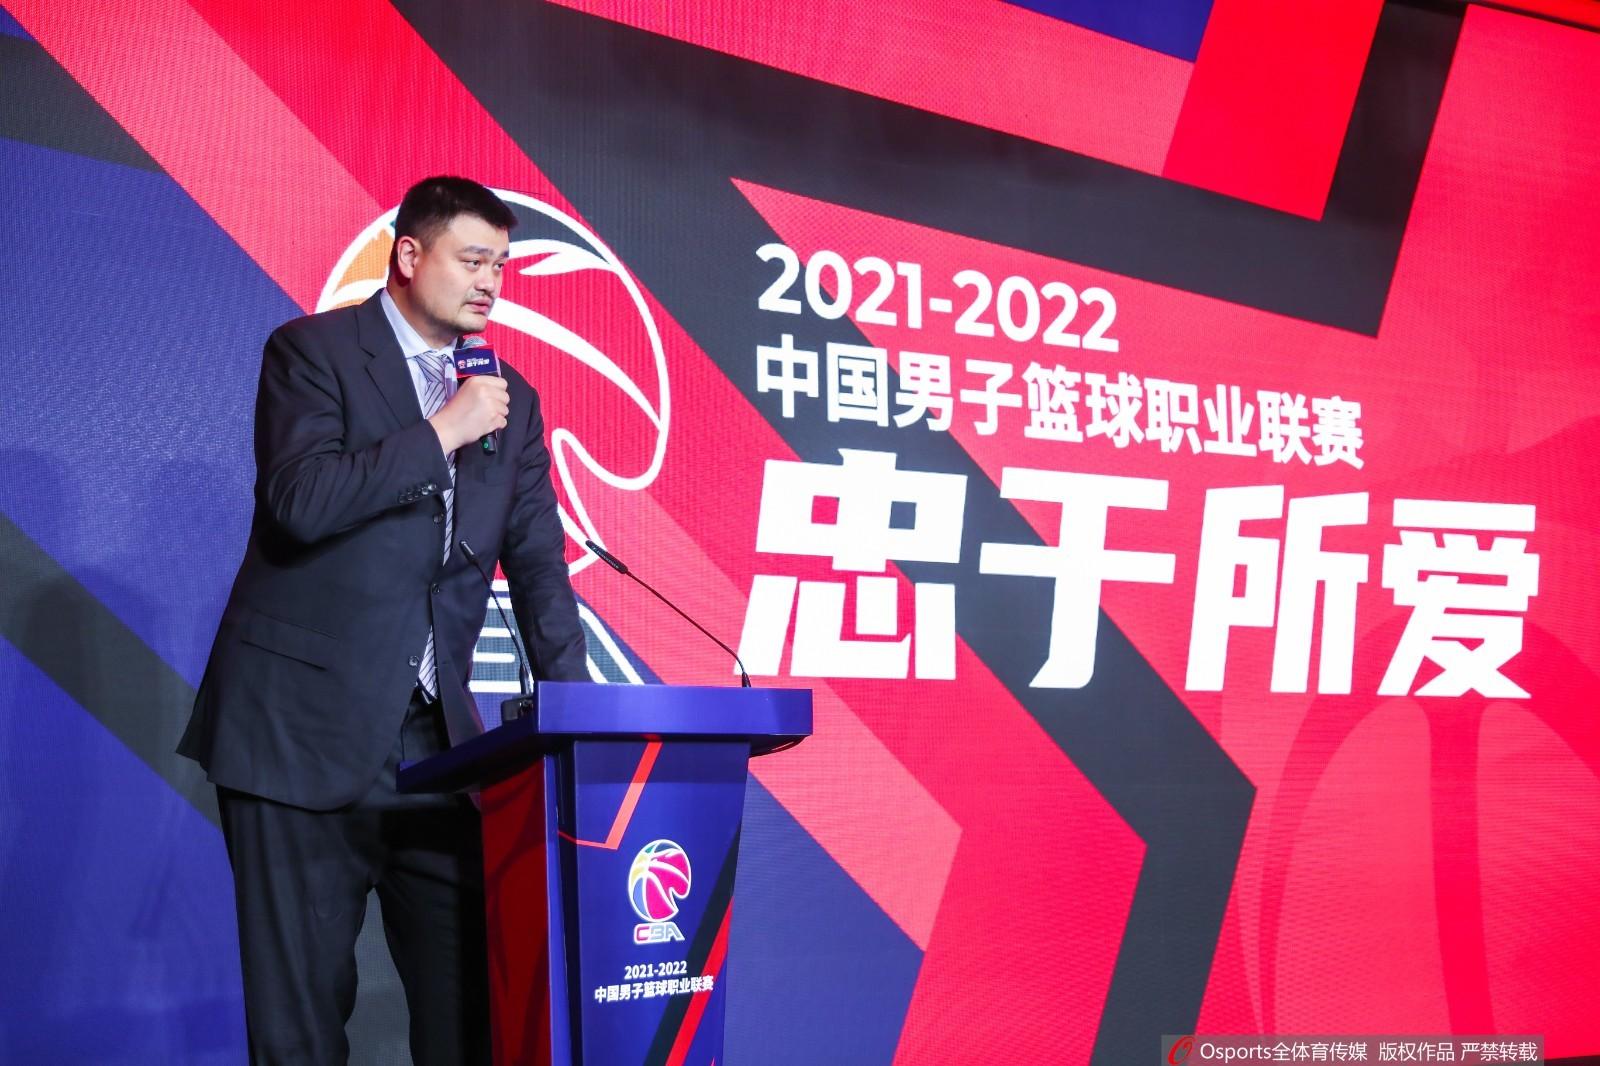 CBA前13轮赛会制比赛向观众售票,姚明相信未来能恢复主客场赛制